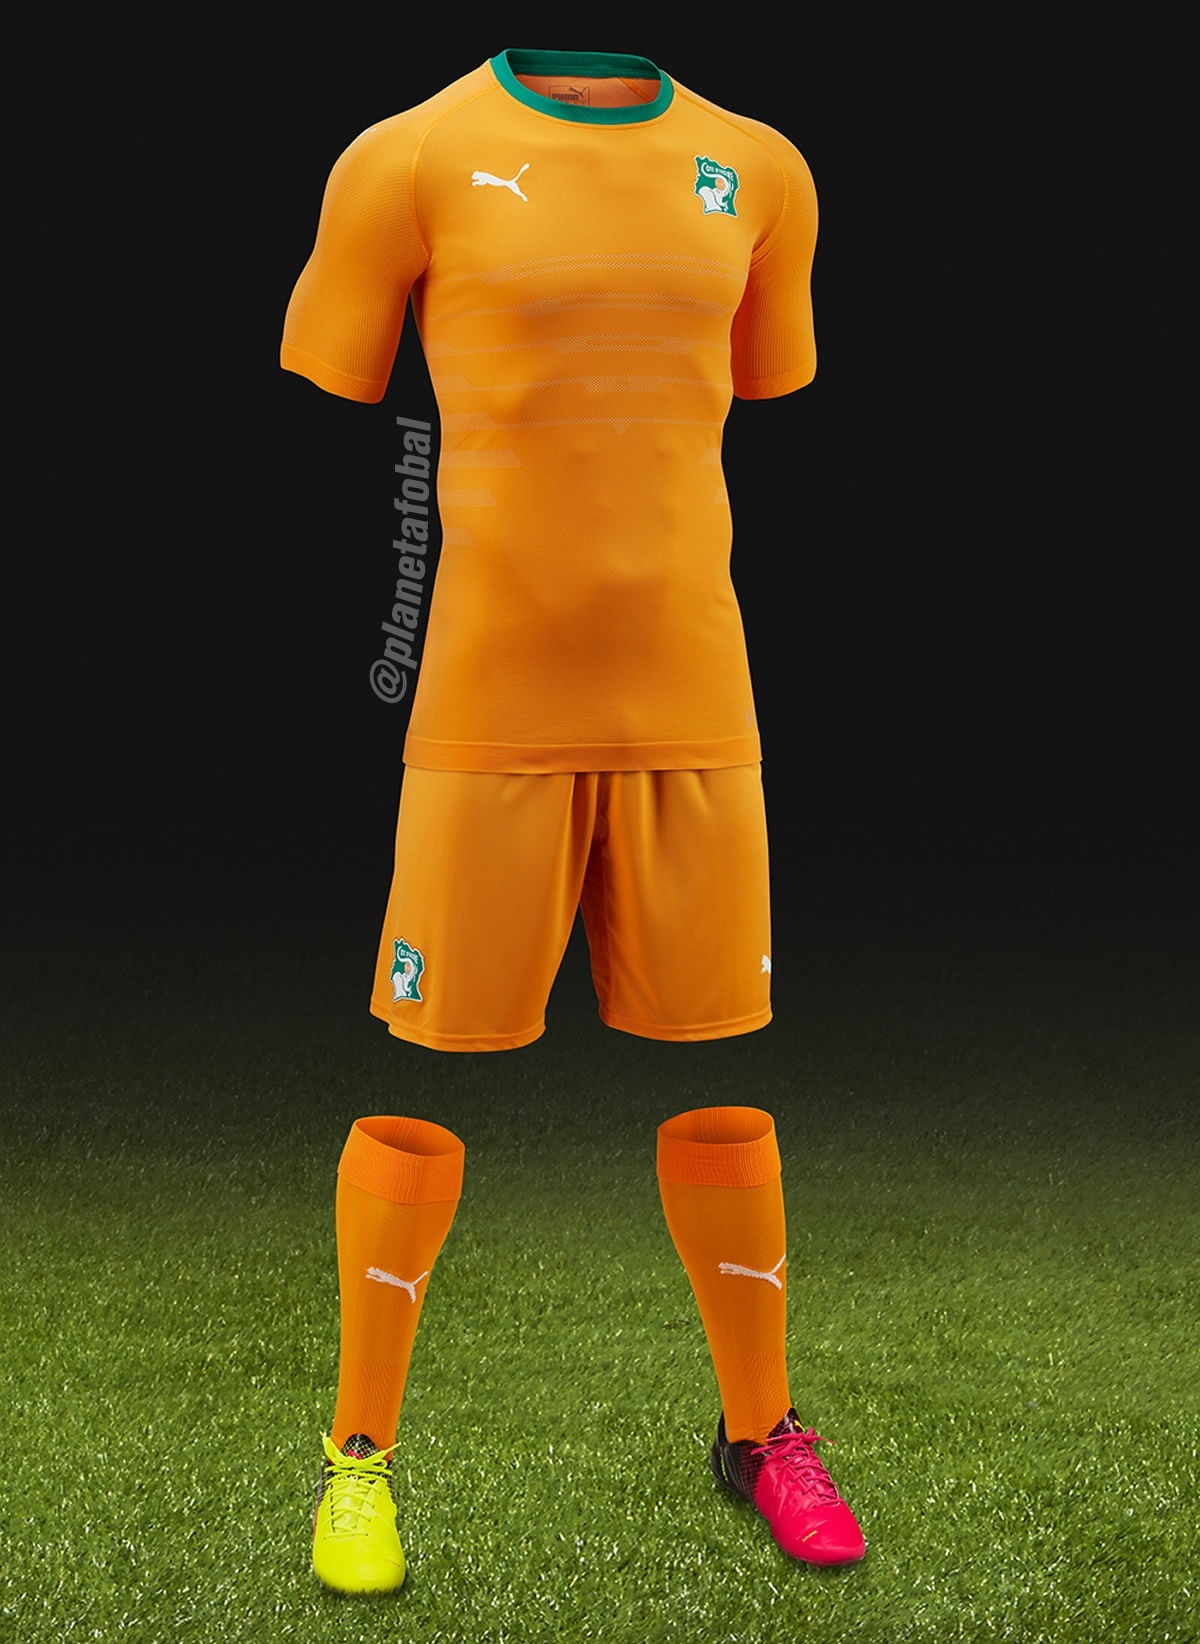 Nueva camiseta de Costa de Marfil | Foto Puma